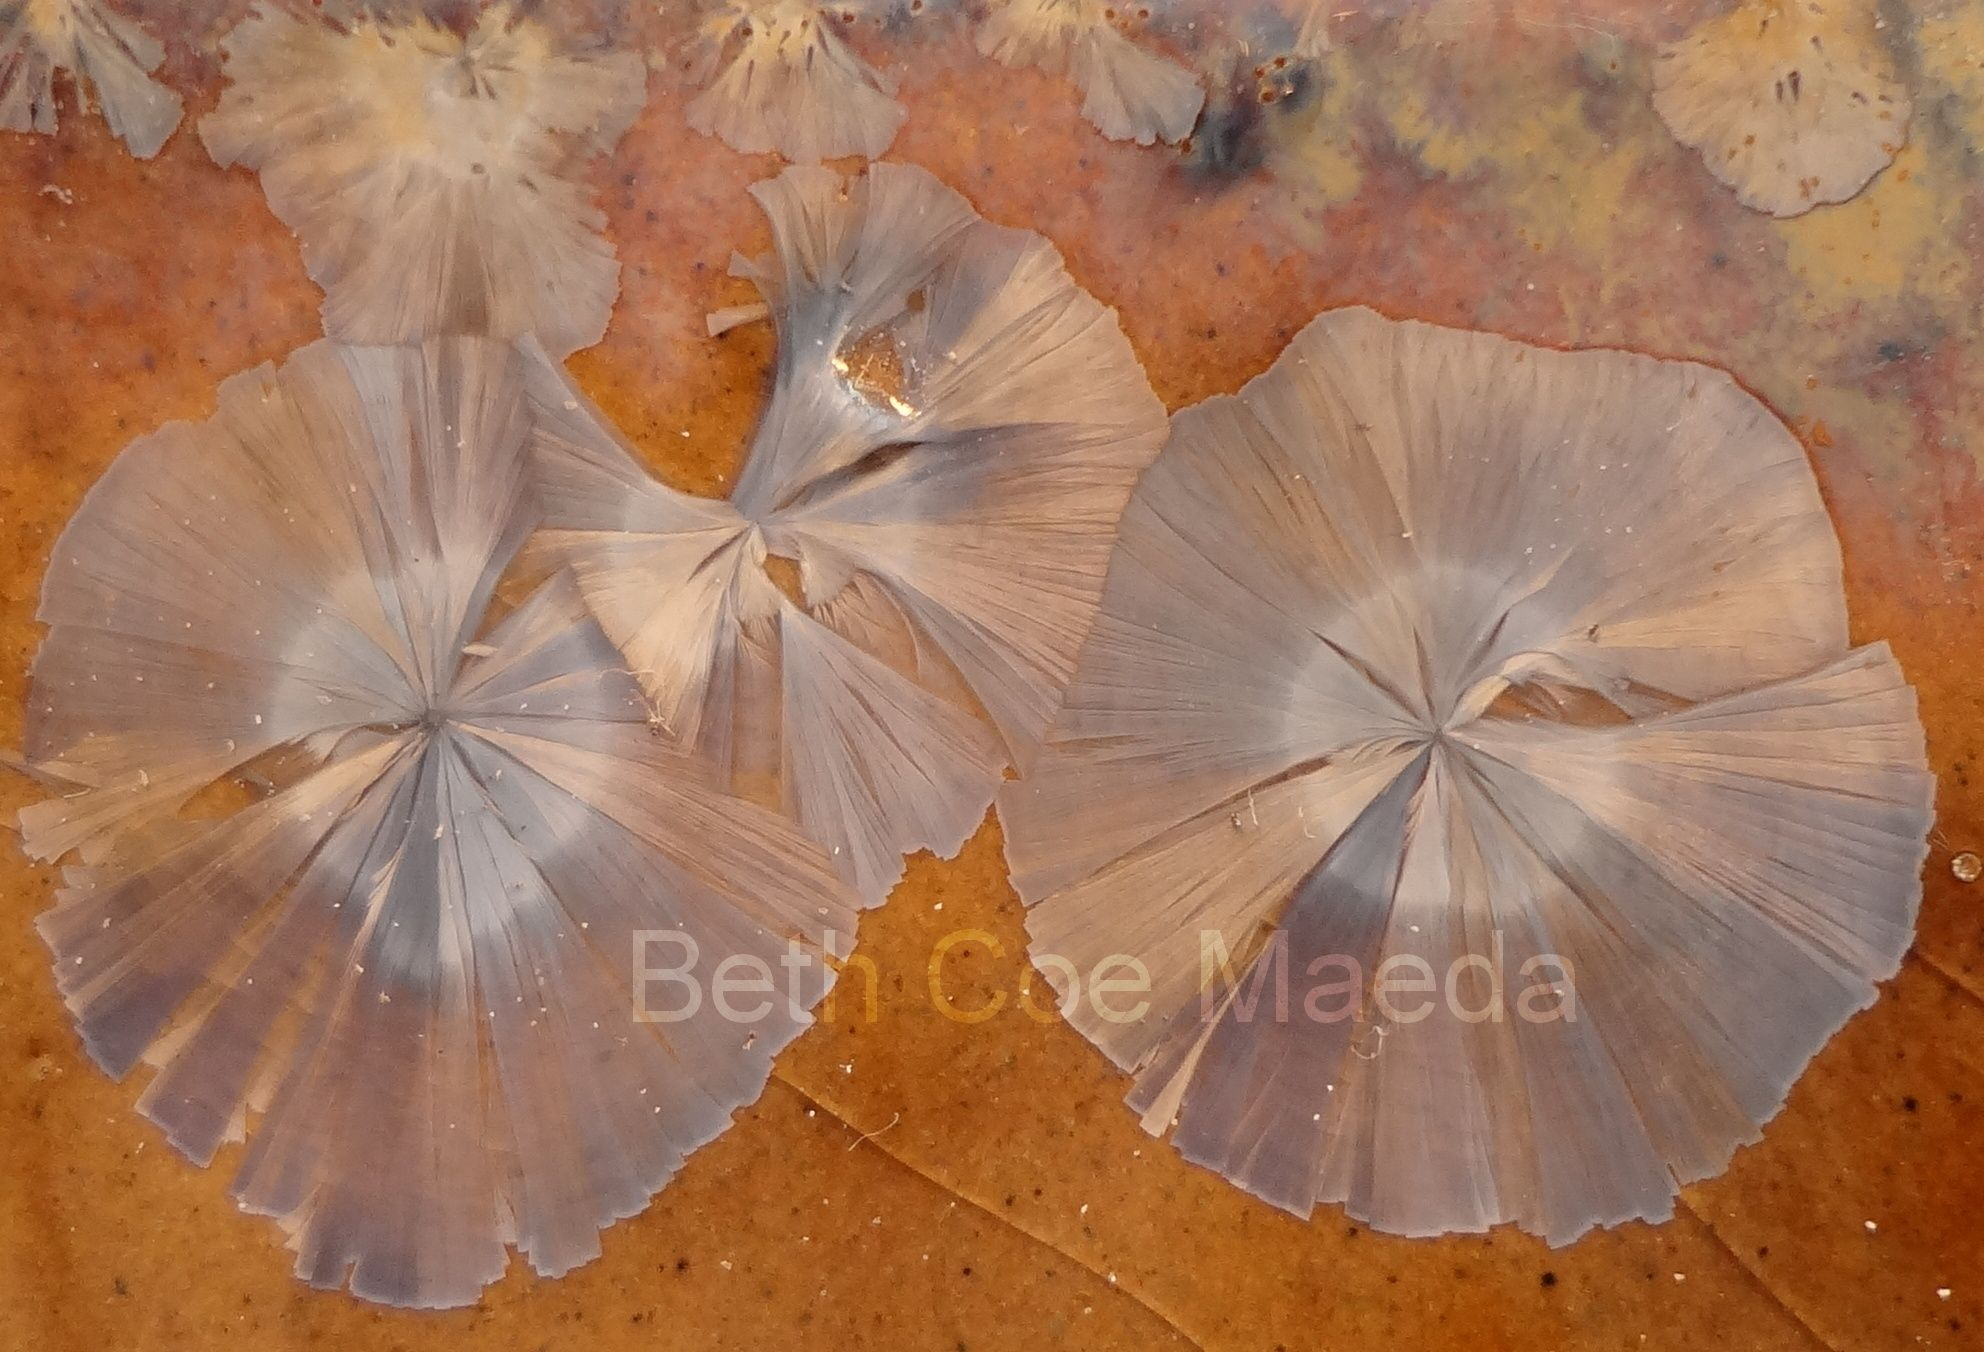 Detalhe de esmalte macrocristalino - crystalline glaze